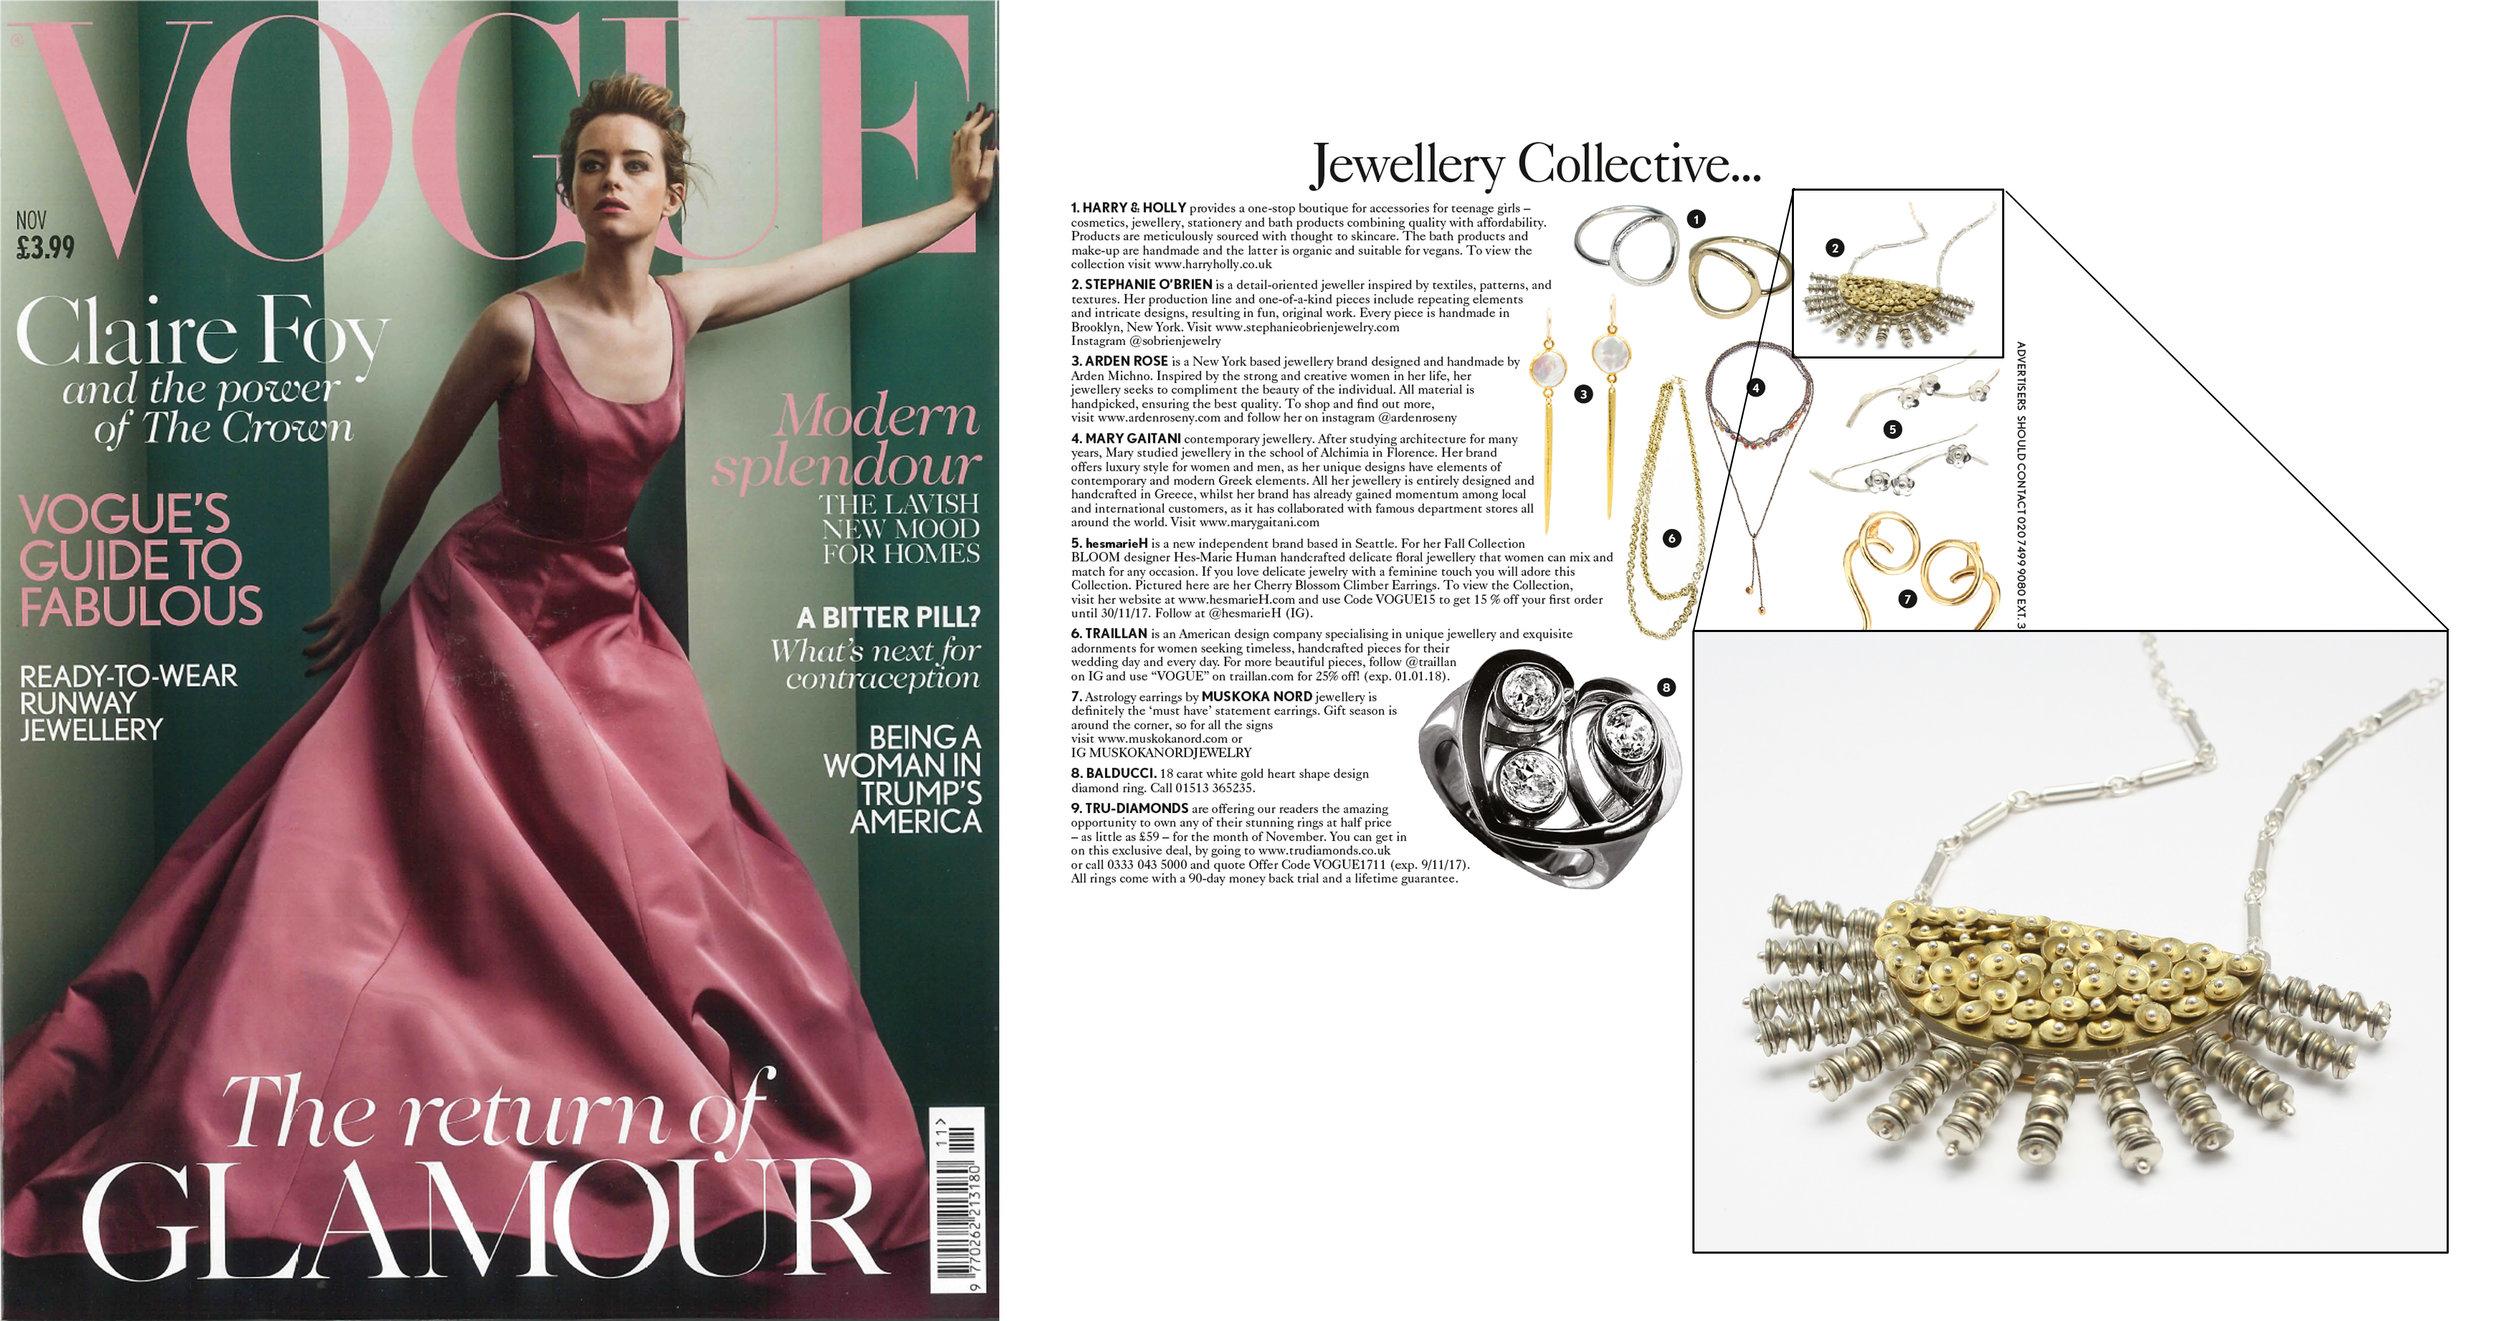 British Vogue Jewellery Collective...,November 2017